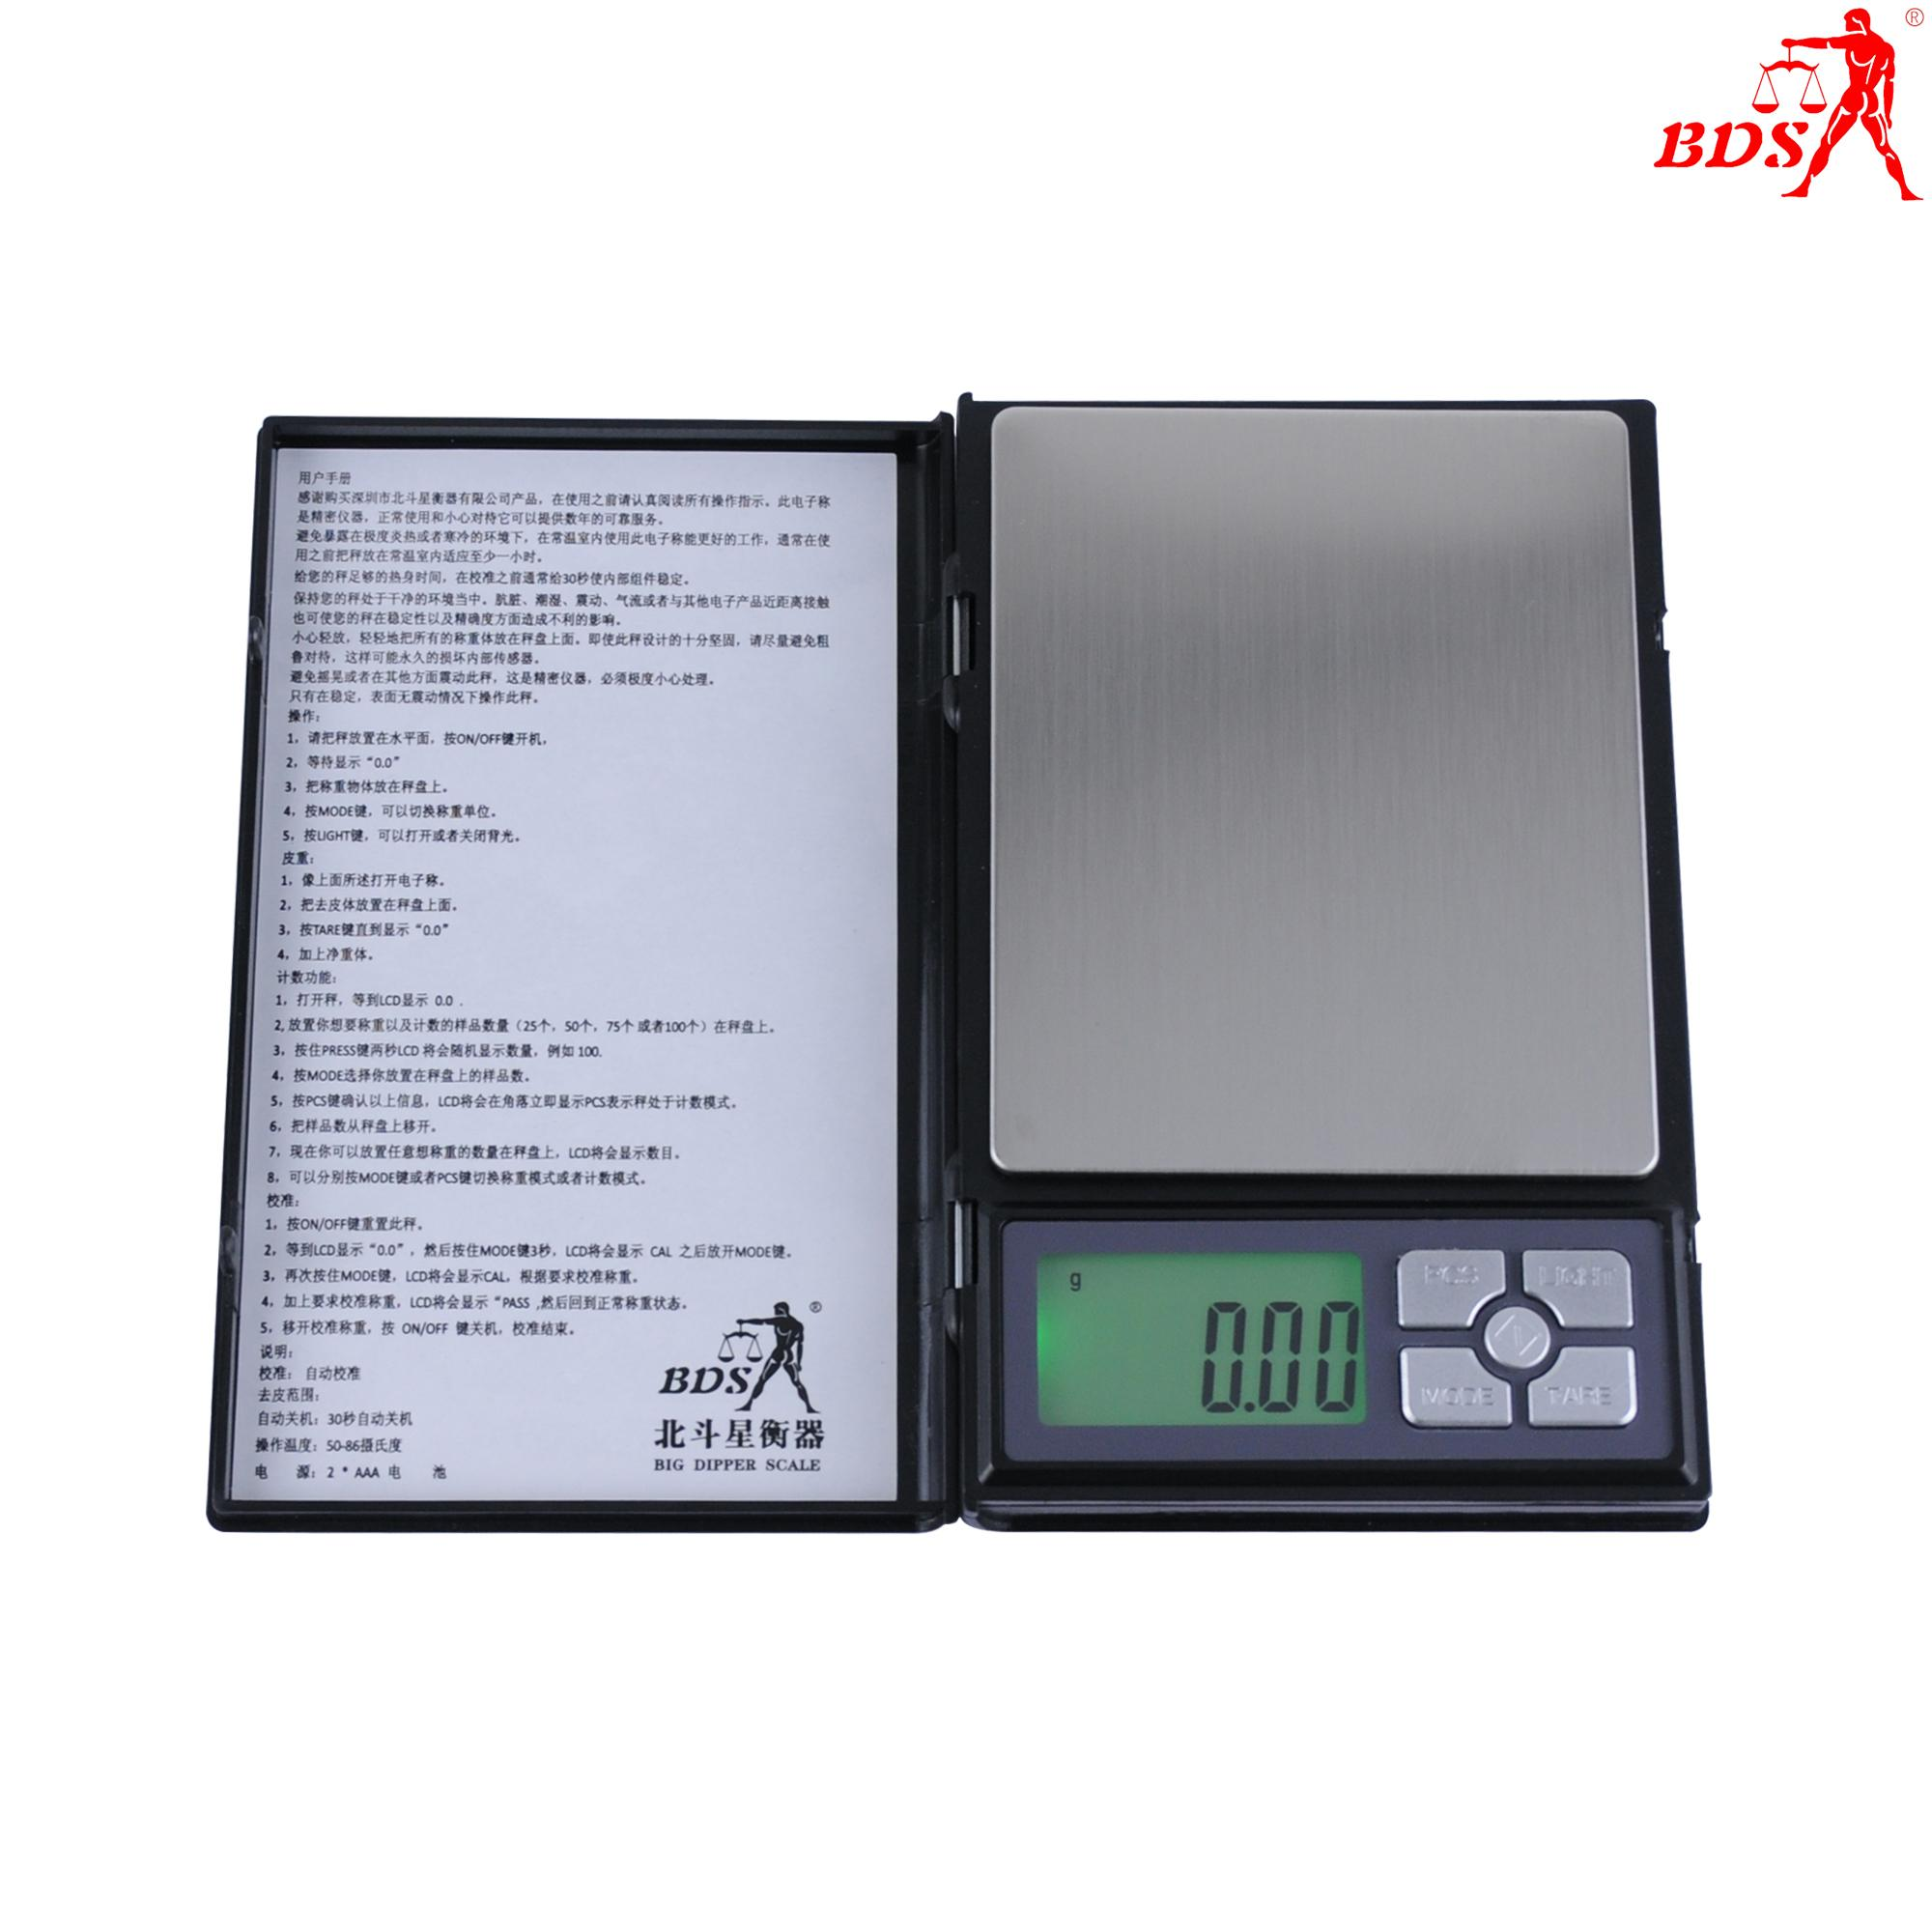 Shenzhen BDS1108 big jewelry scale, pocket scale manufacturer